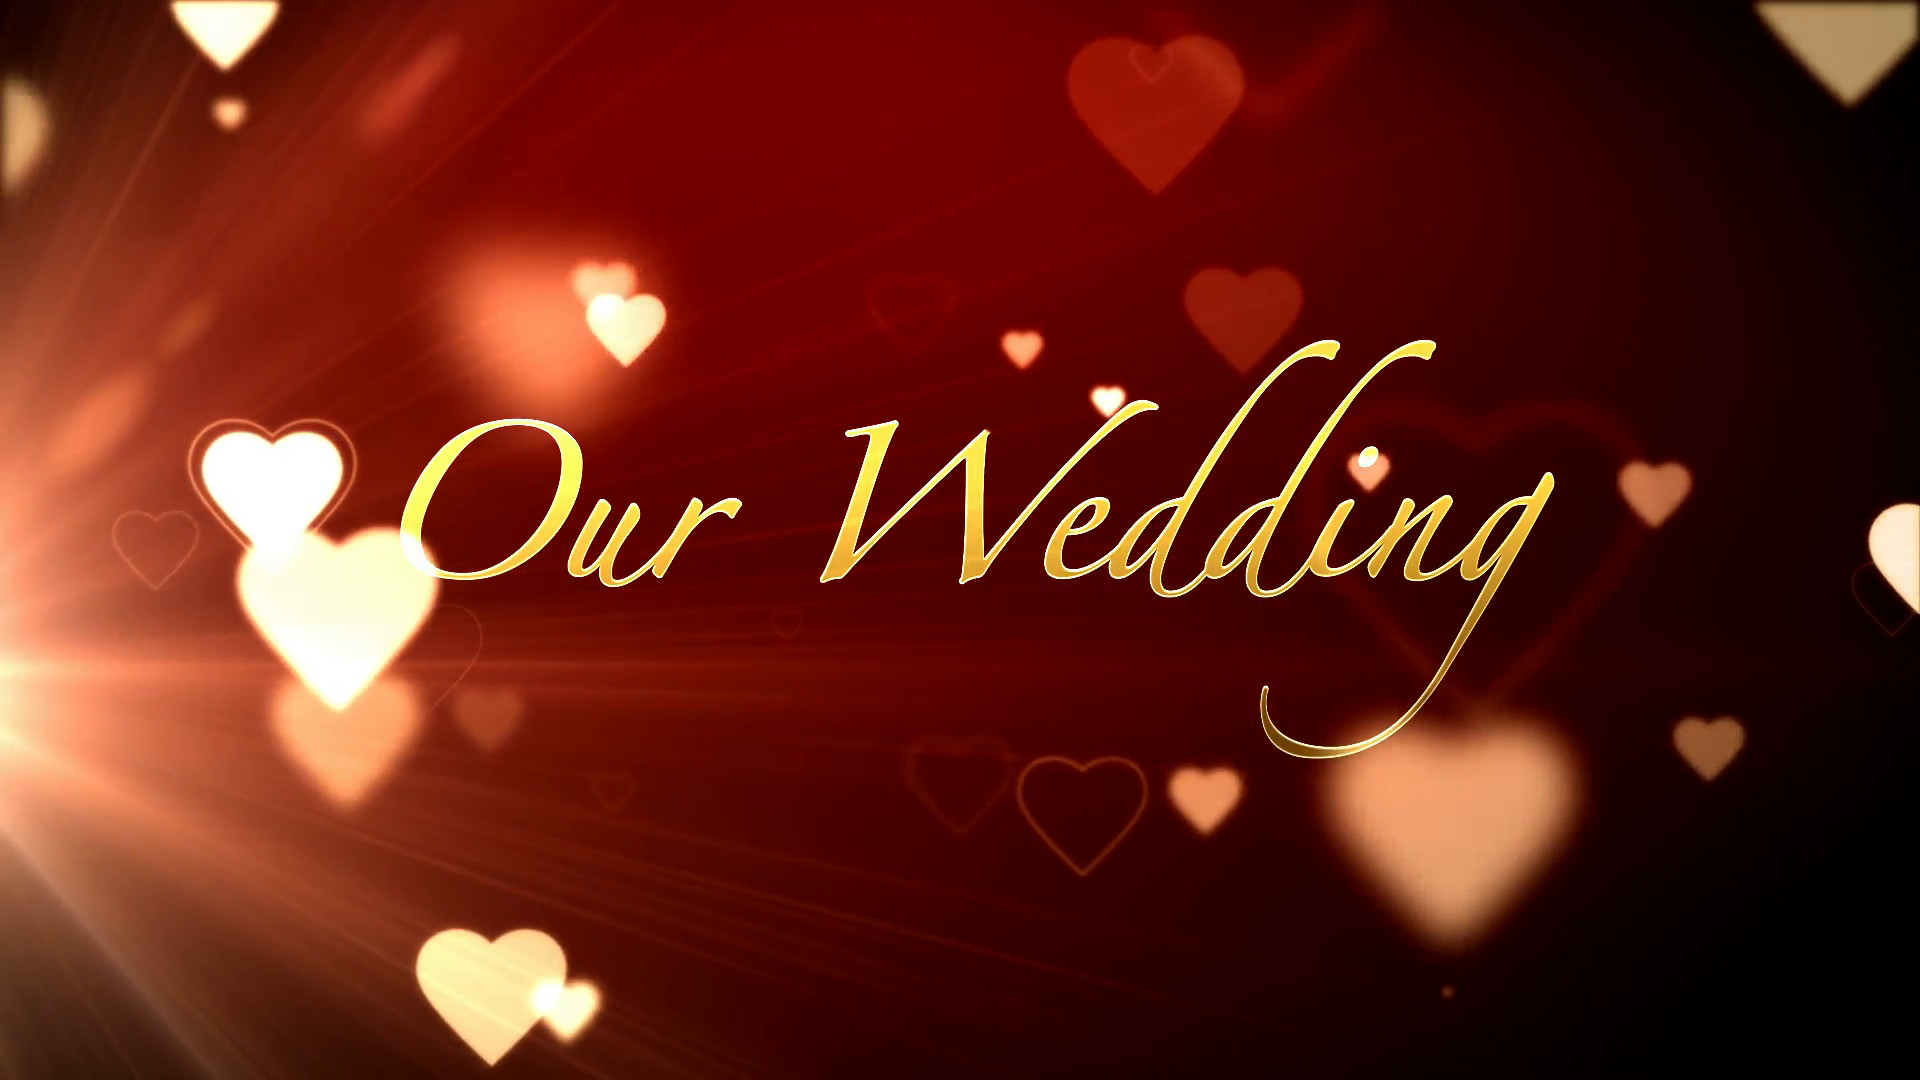 Free Wedding Invitation Background Images: Wedding Website Backgrounds ·① WallpaperTag